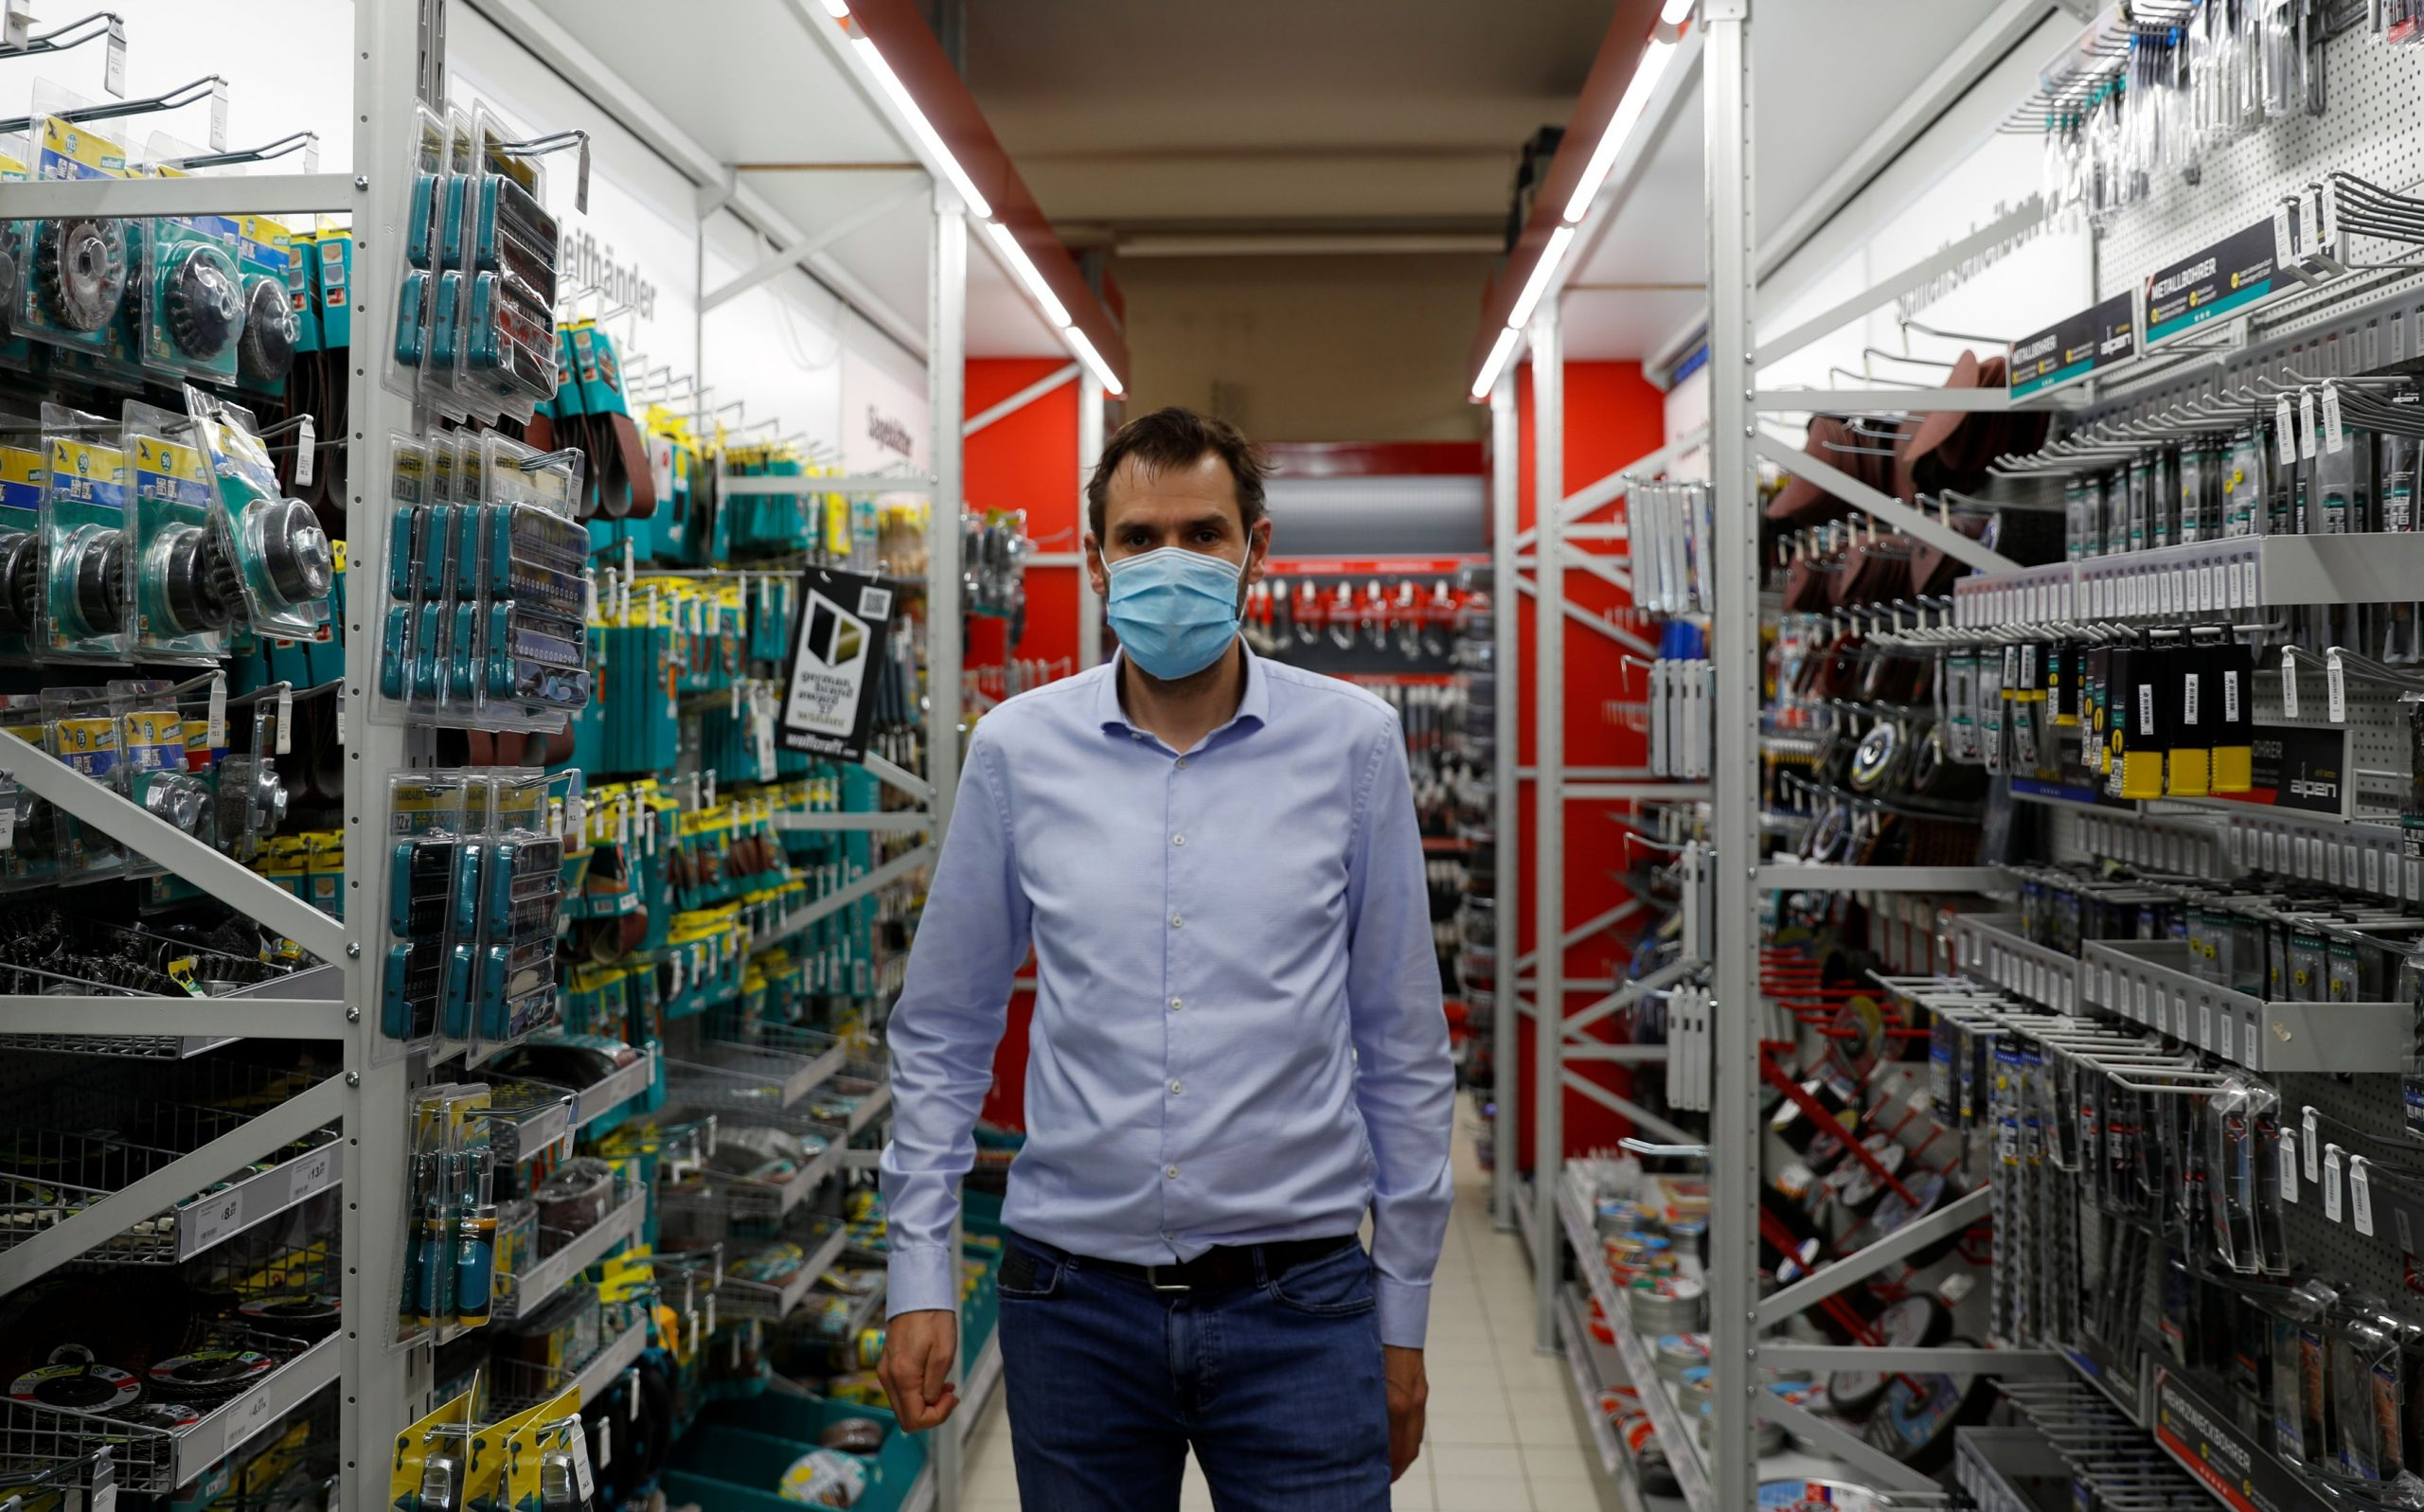 Austrija se dobro nosi s koronavirusom / REUTERS